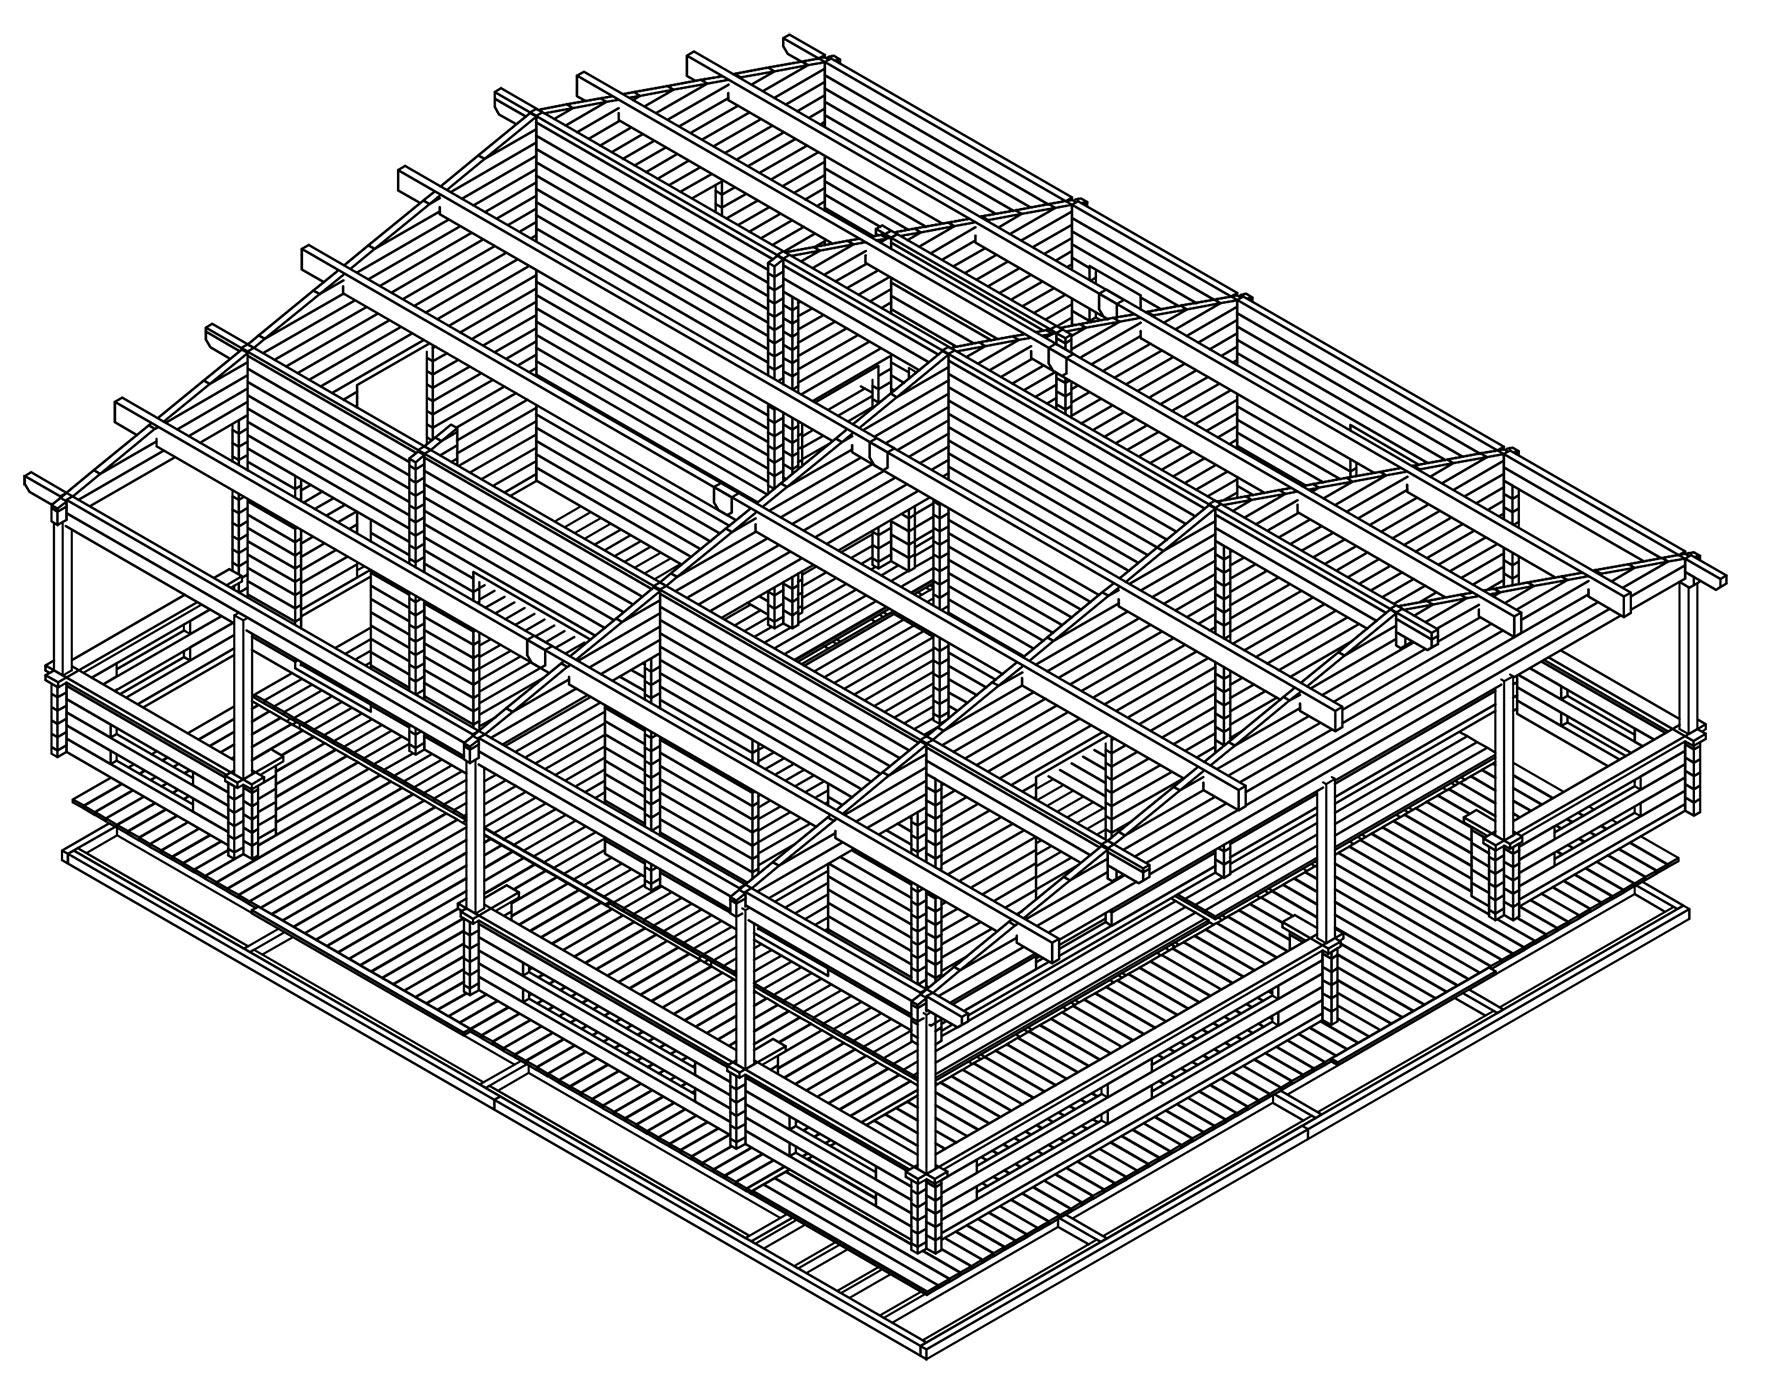 Bespoke Log Cabin plans